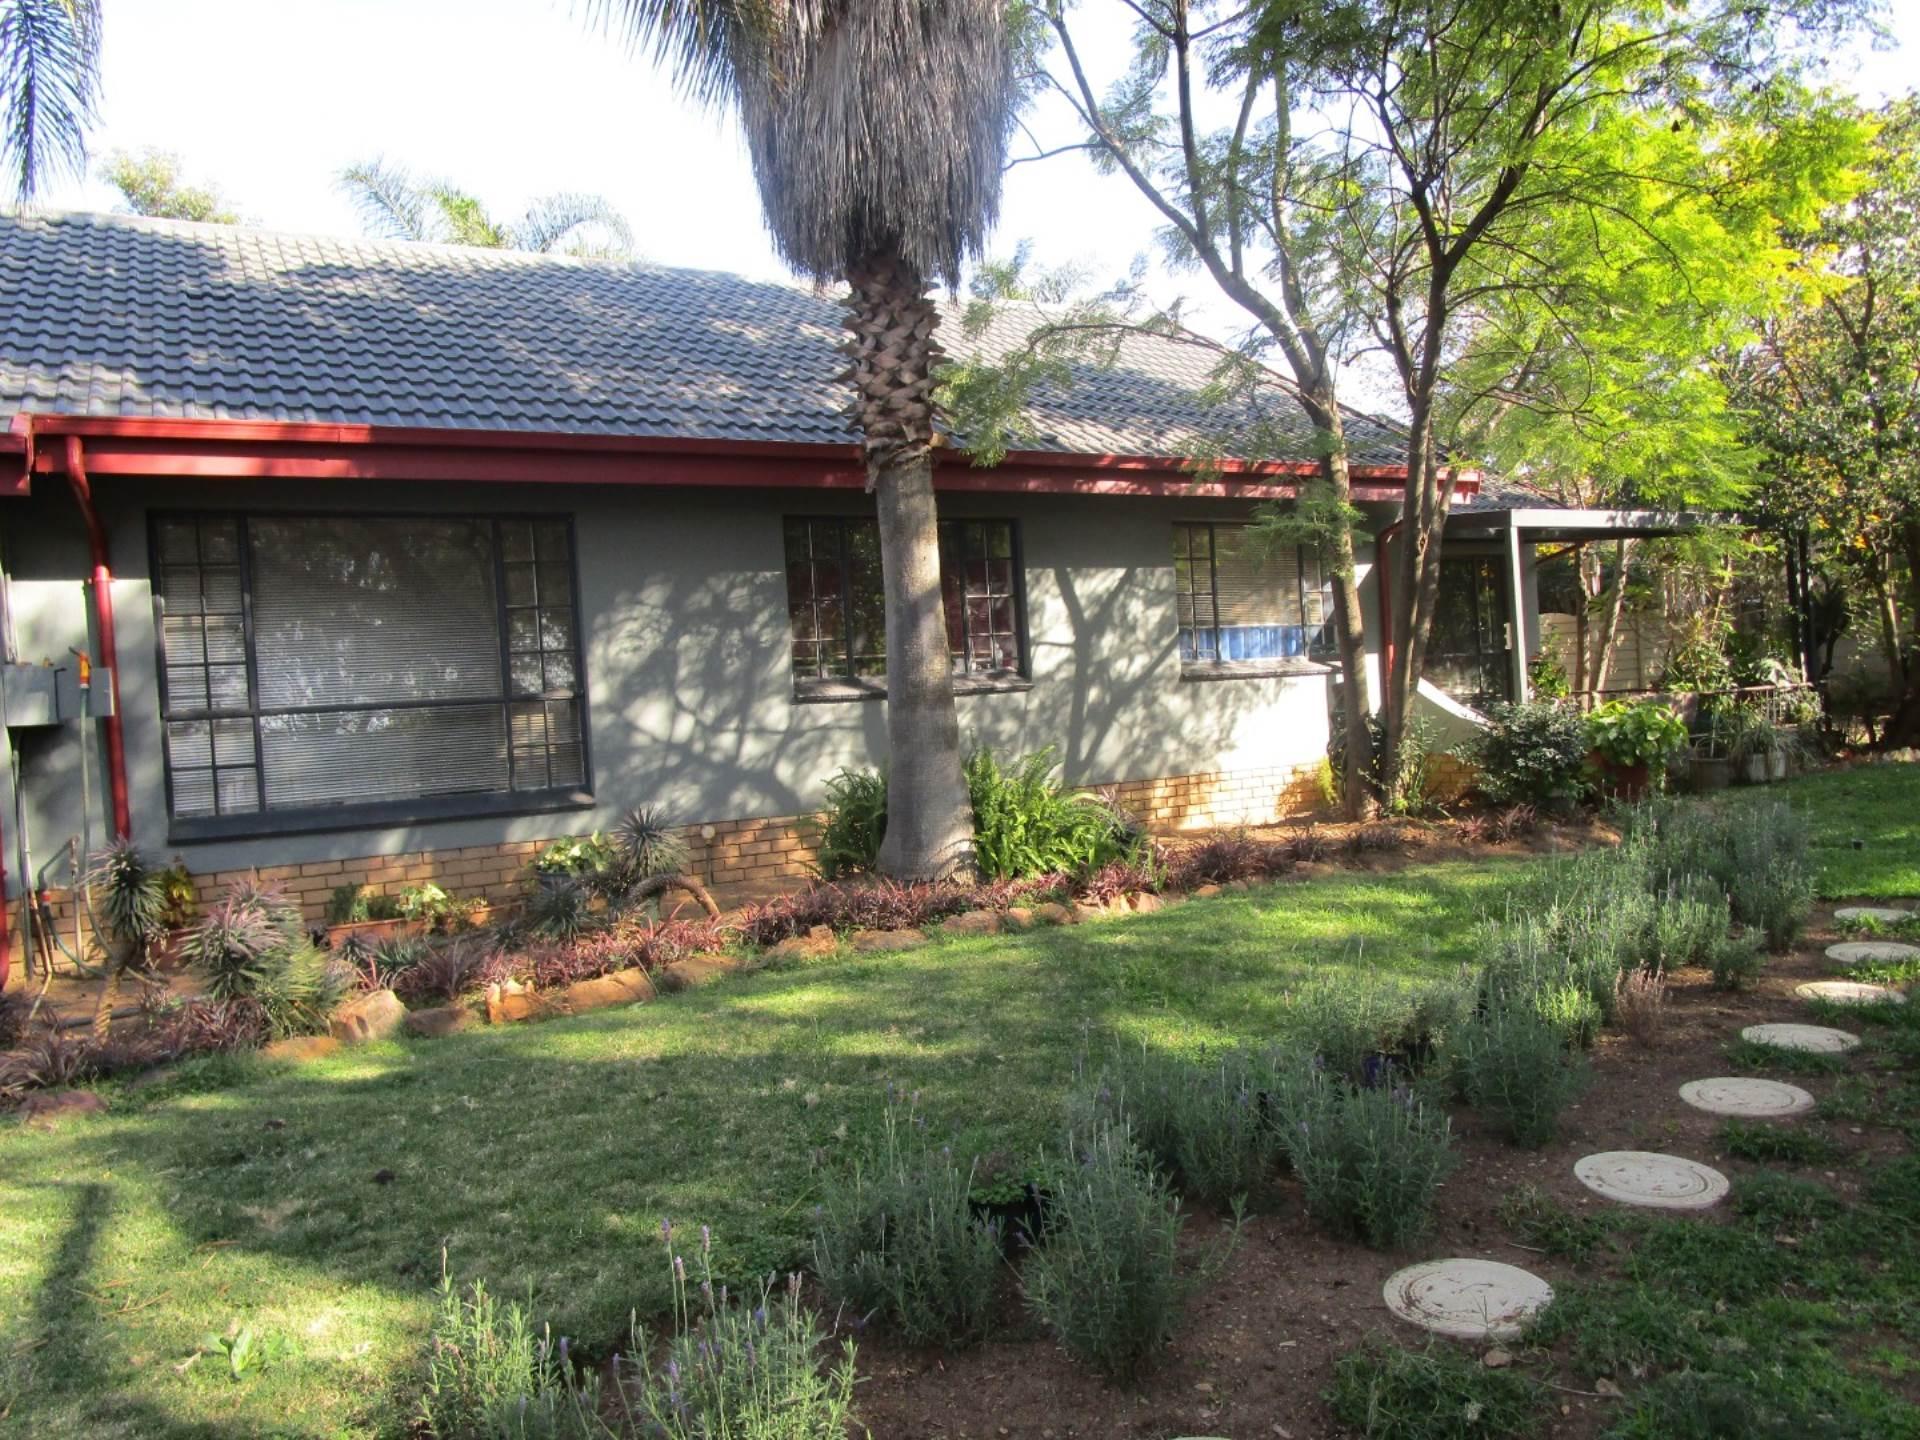 House For Sale In Meyerspark Pretoria Gauteng For R